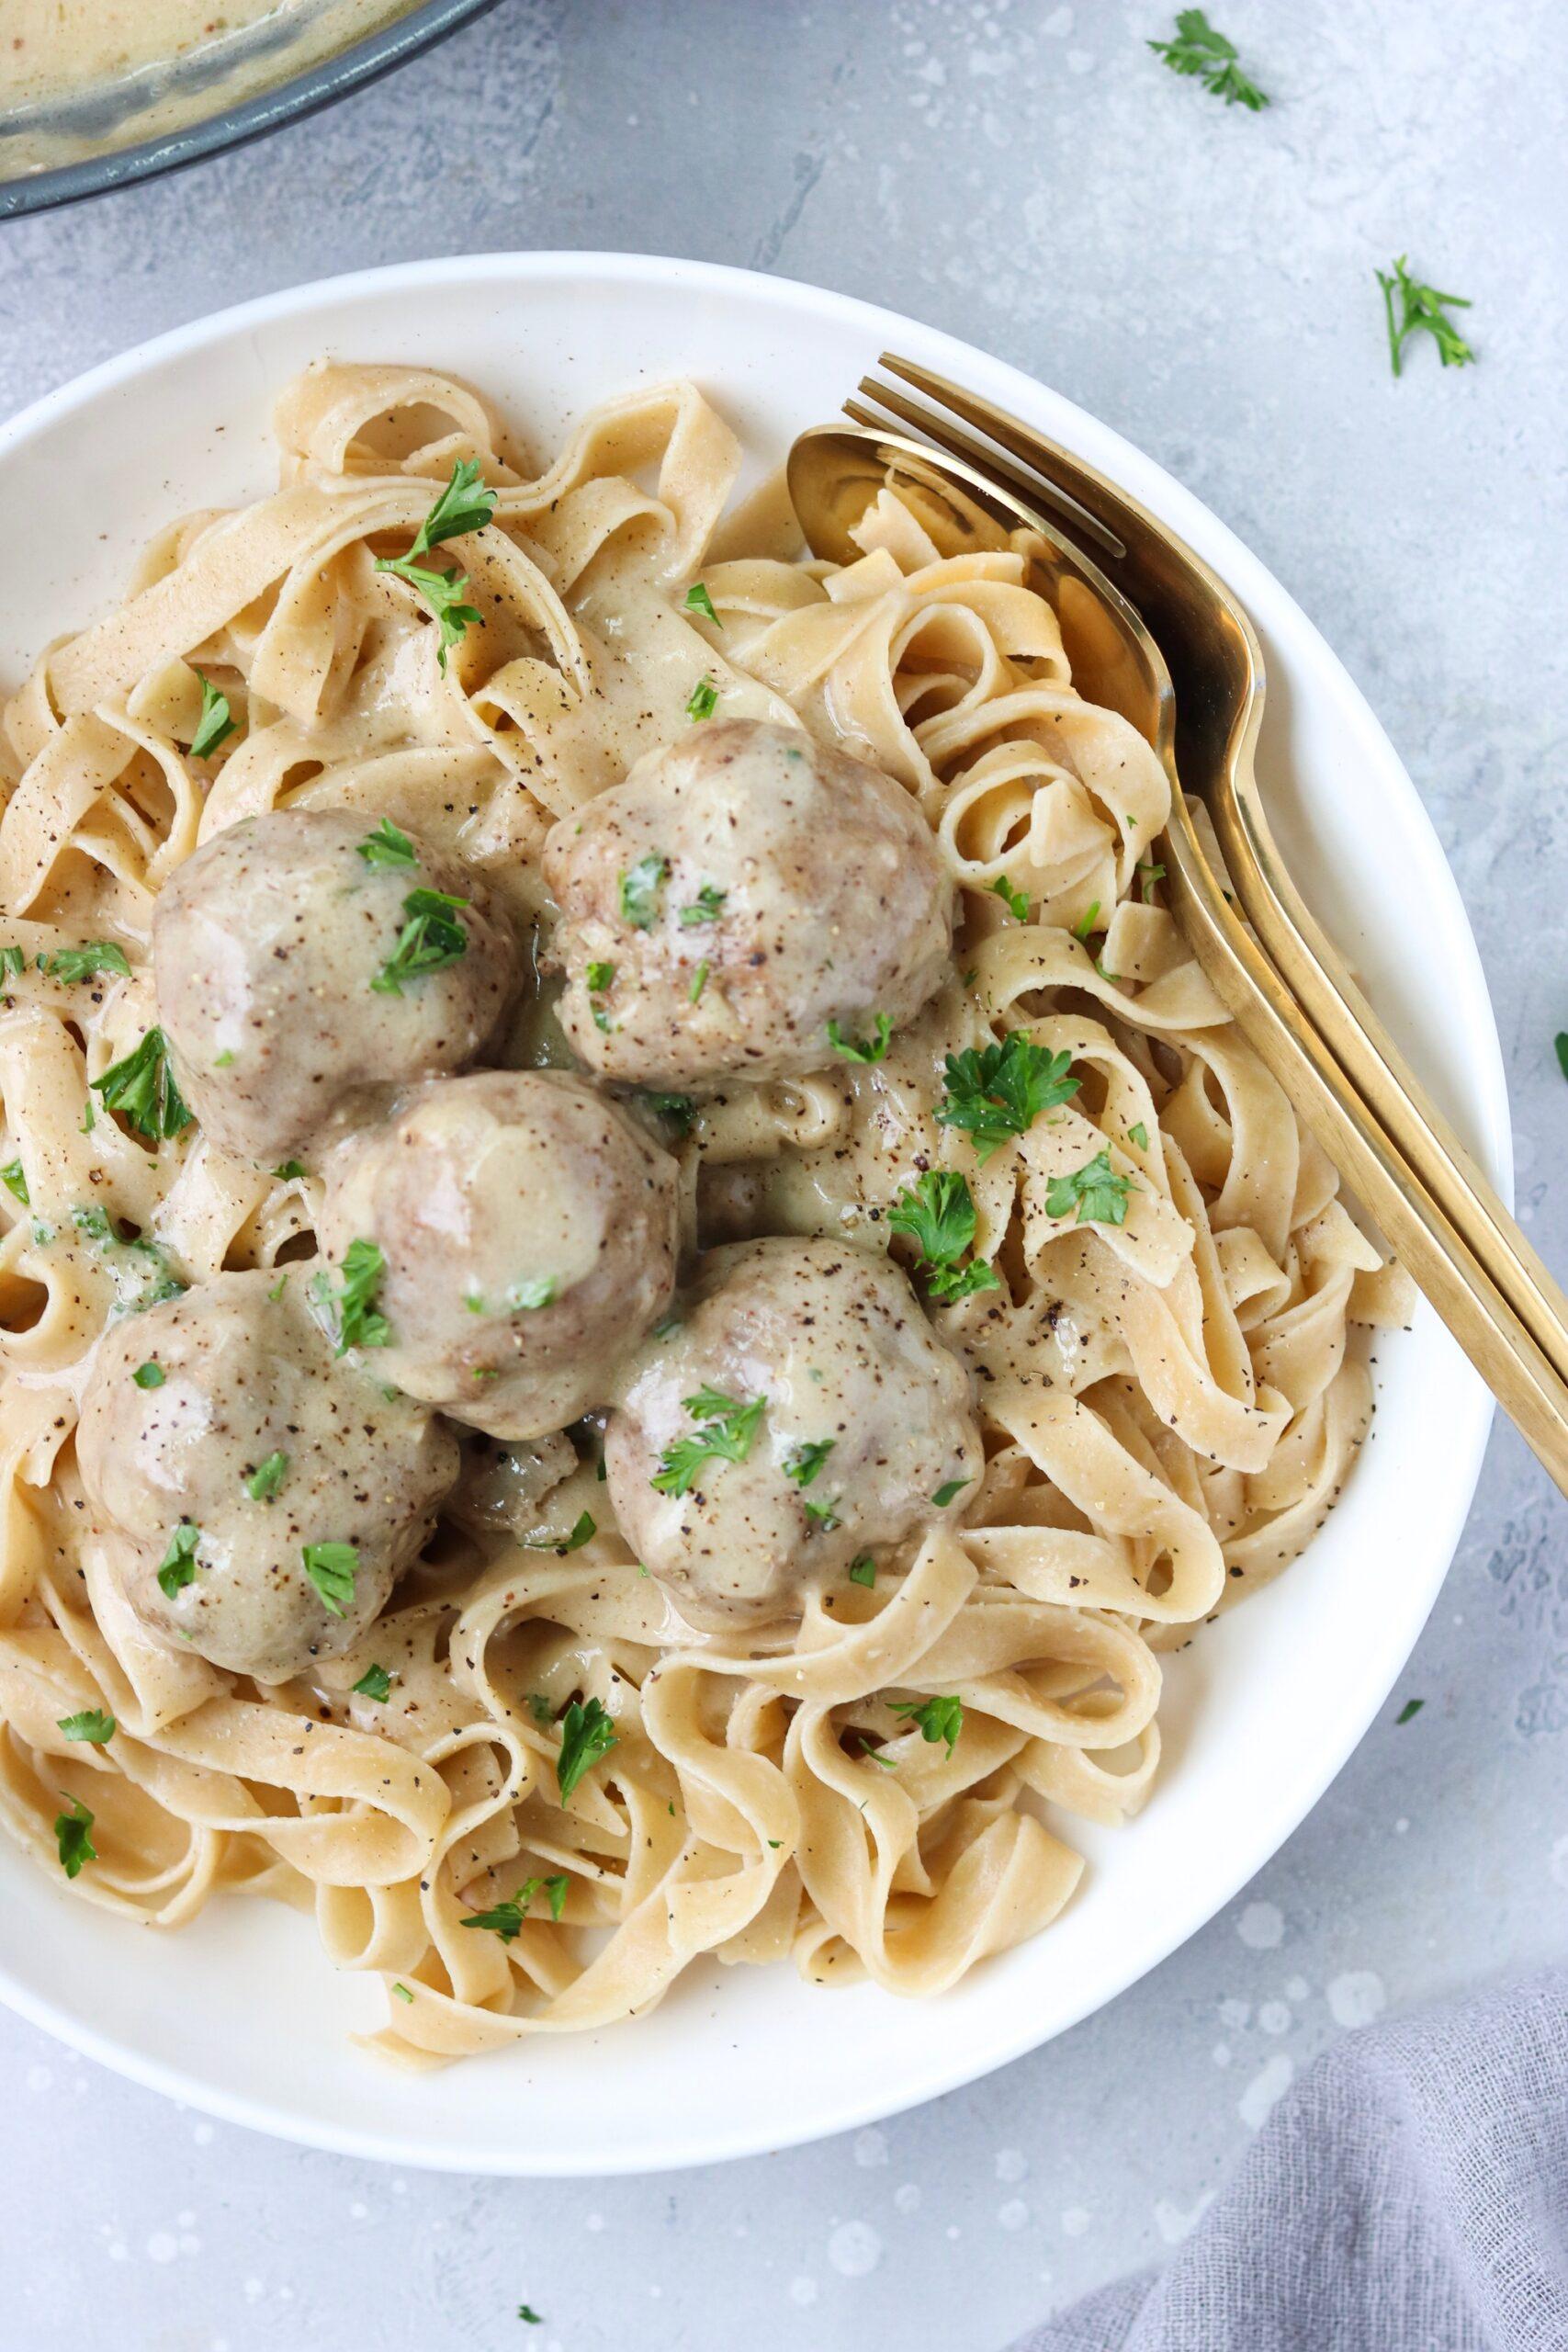 Gluten free Swedish meatballs over pasta